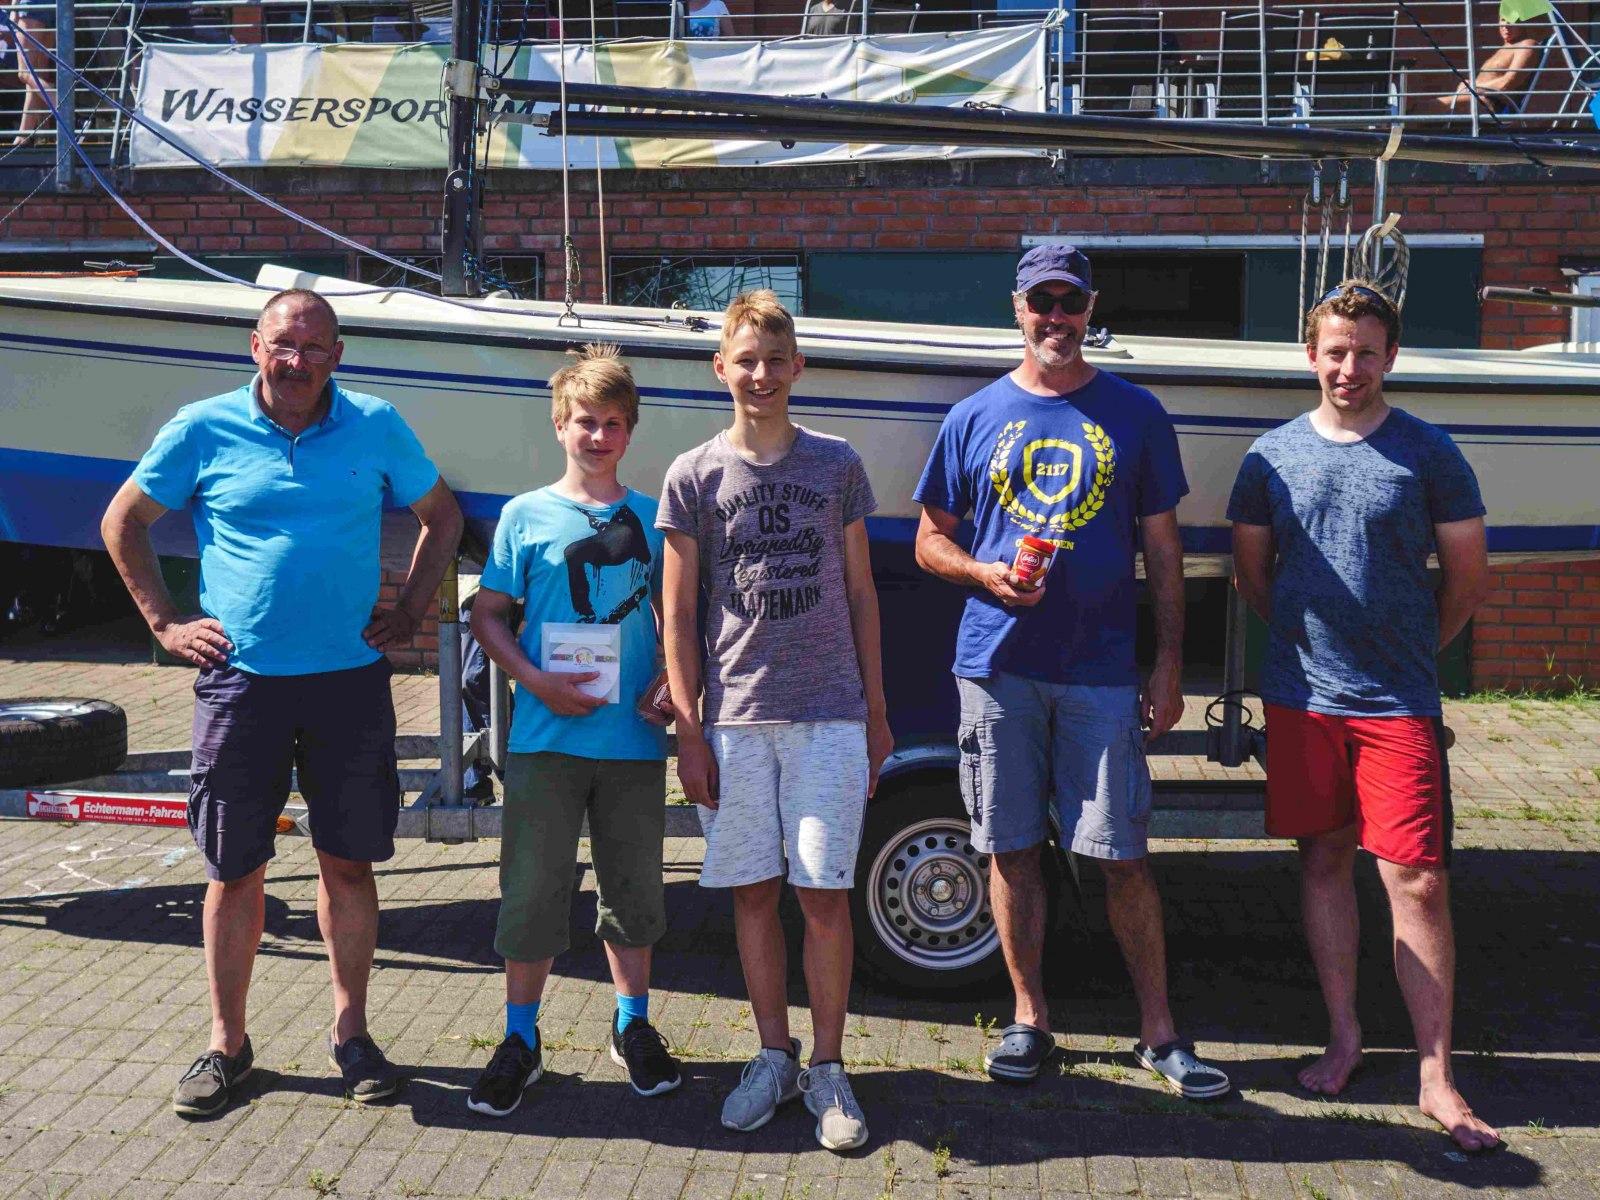 Siegerfoto: (vl) Horst Dobrinski, Ben Zimmermann, Paul Kaatz, Rene Daniels , Jan Schappert